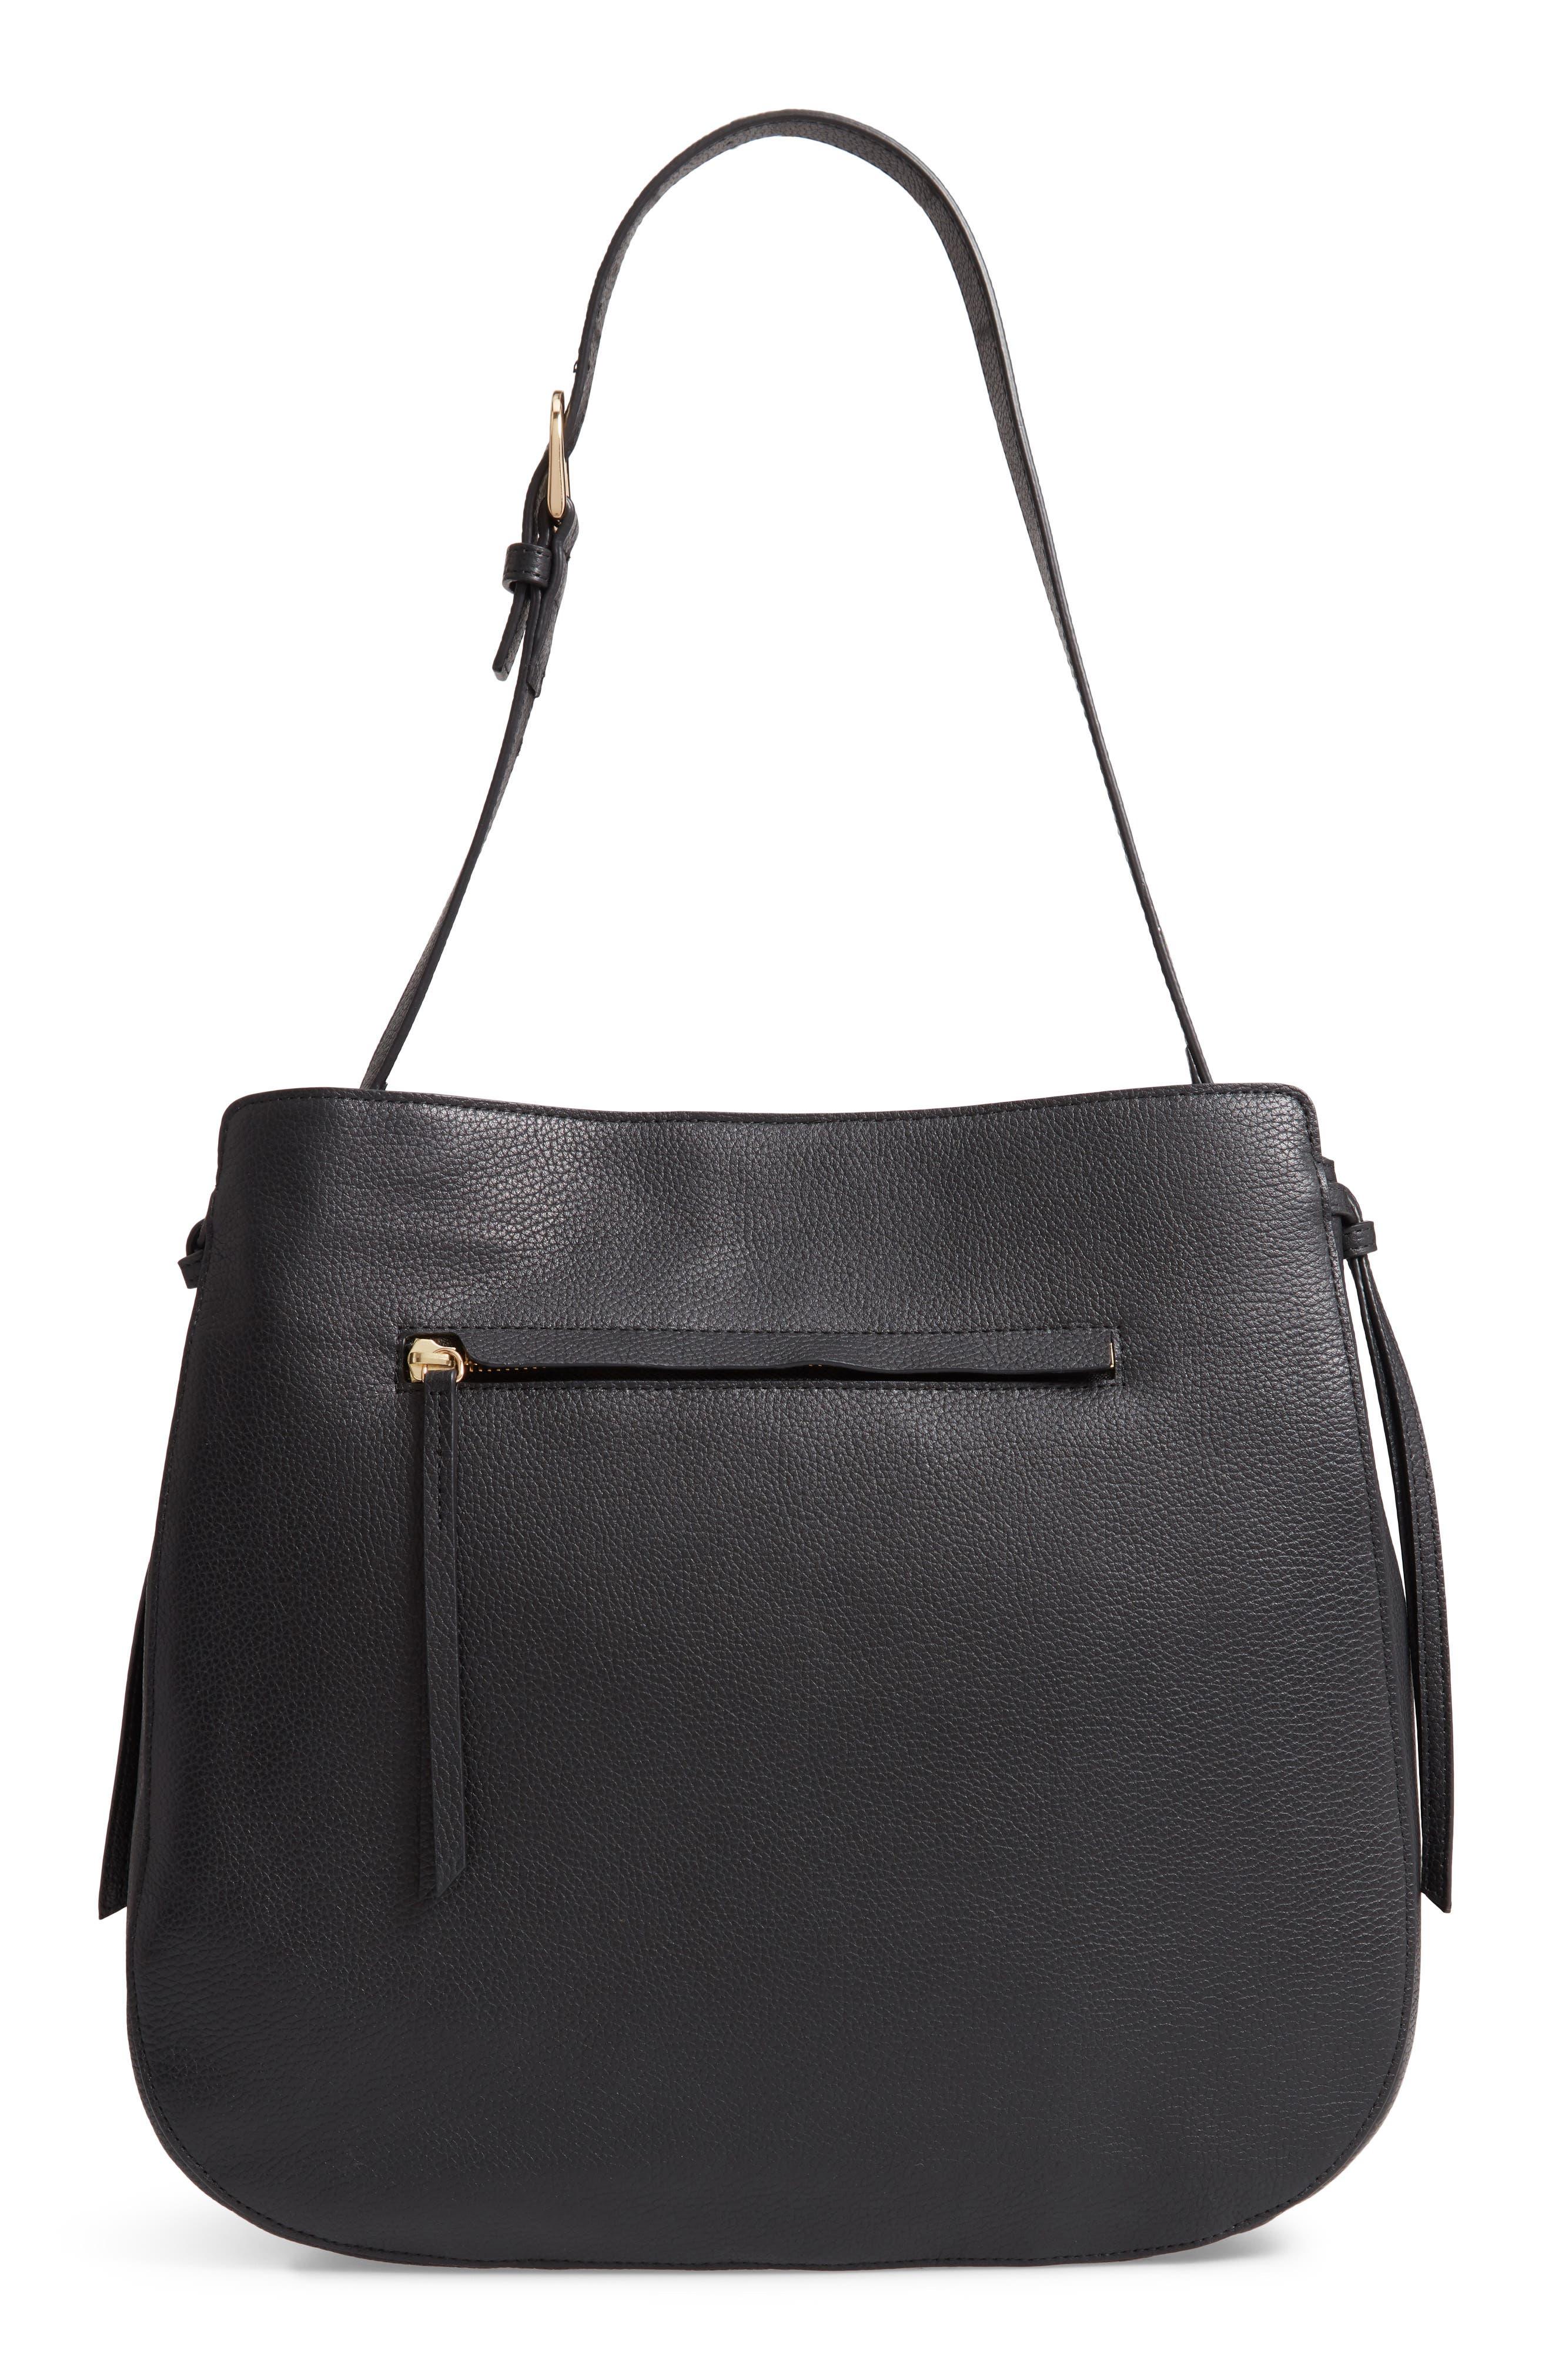 Finley Leather Hobo,                             Main thumbnail 1, color,                             BLACK